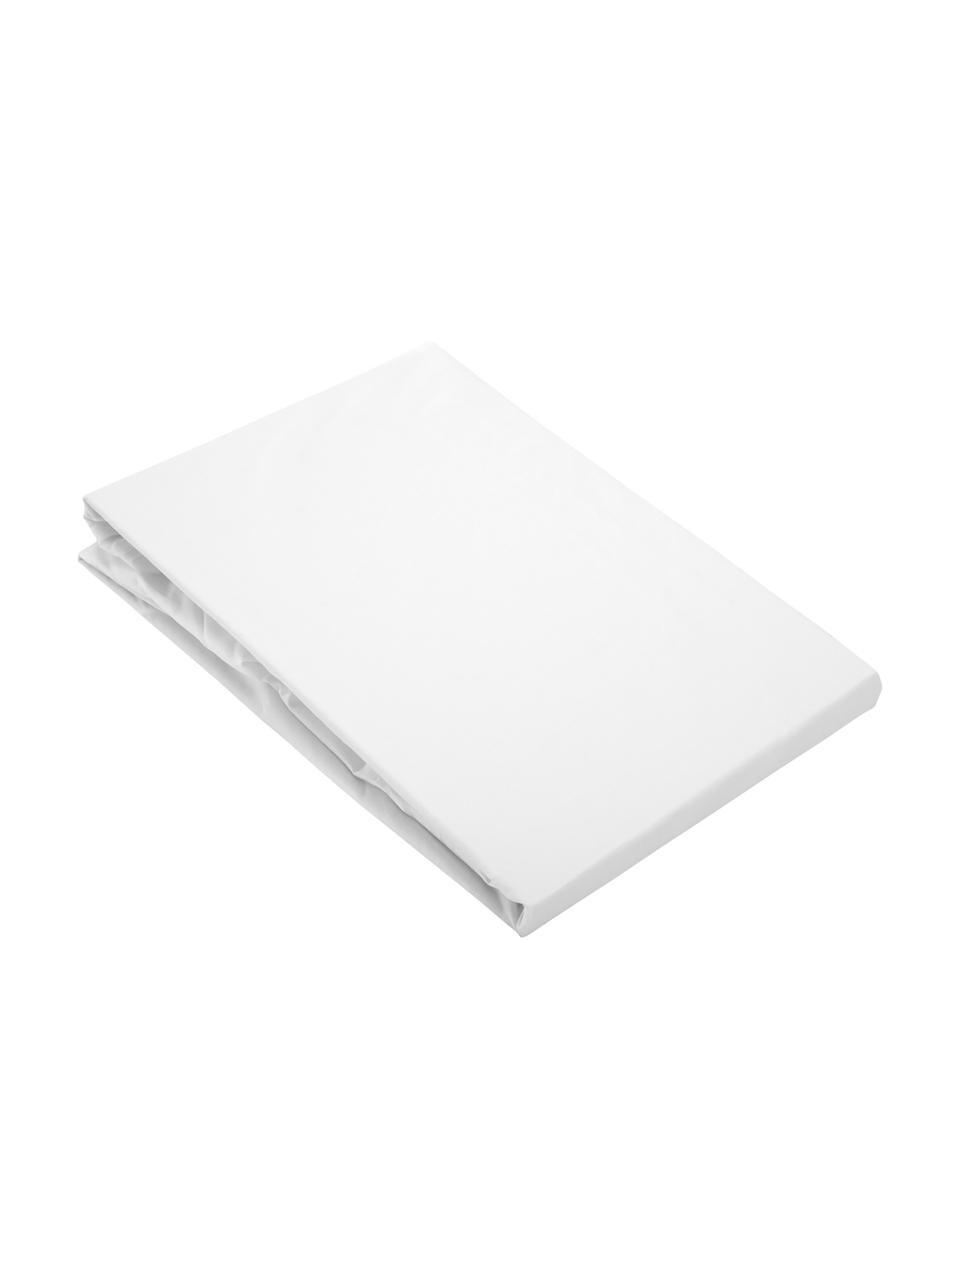 Drap-housse blanc en percale Elsie, Blanc